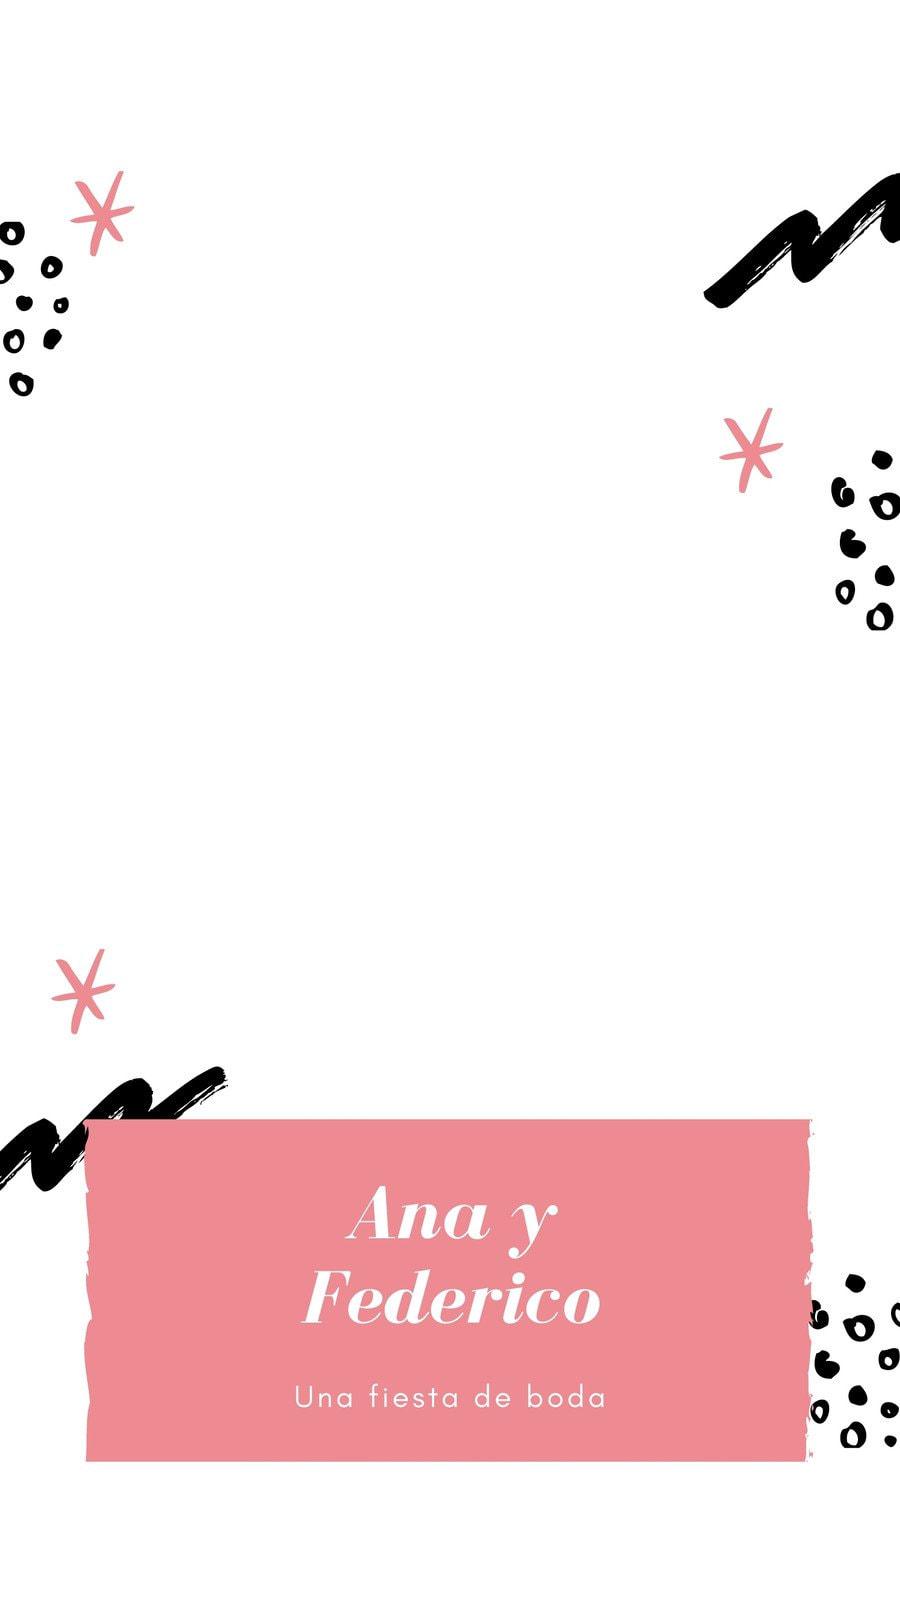 Rosa Pincelada Boda Geofiltro de Snapchat